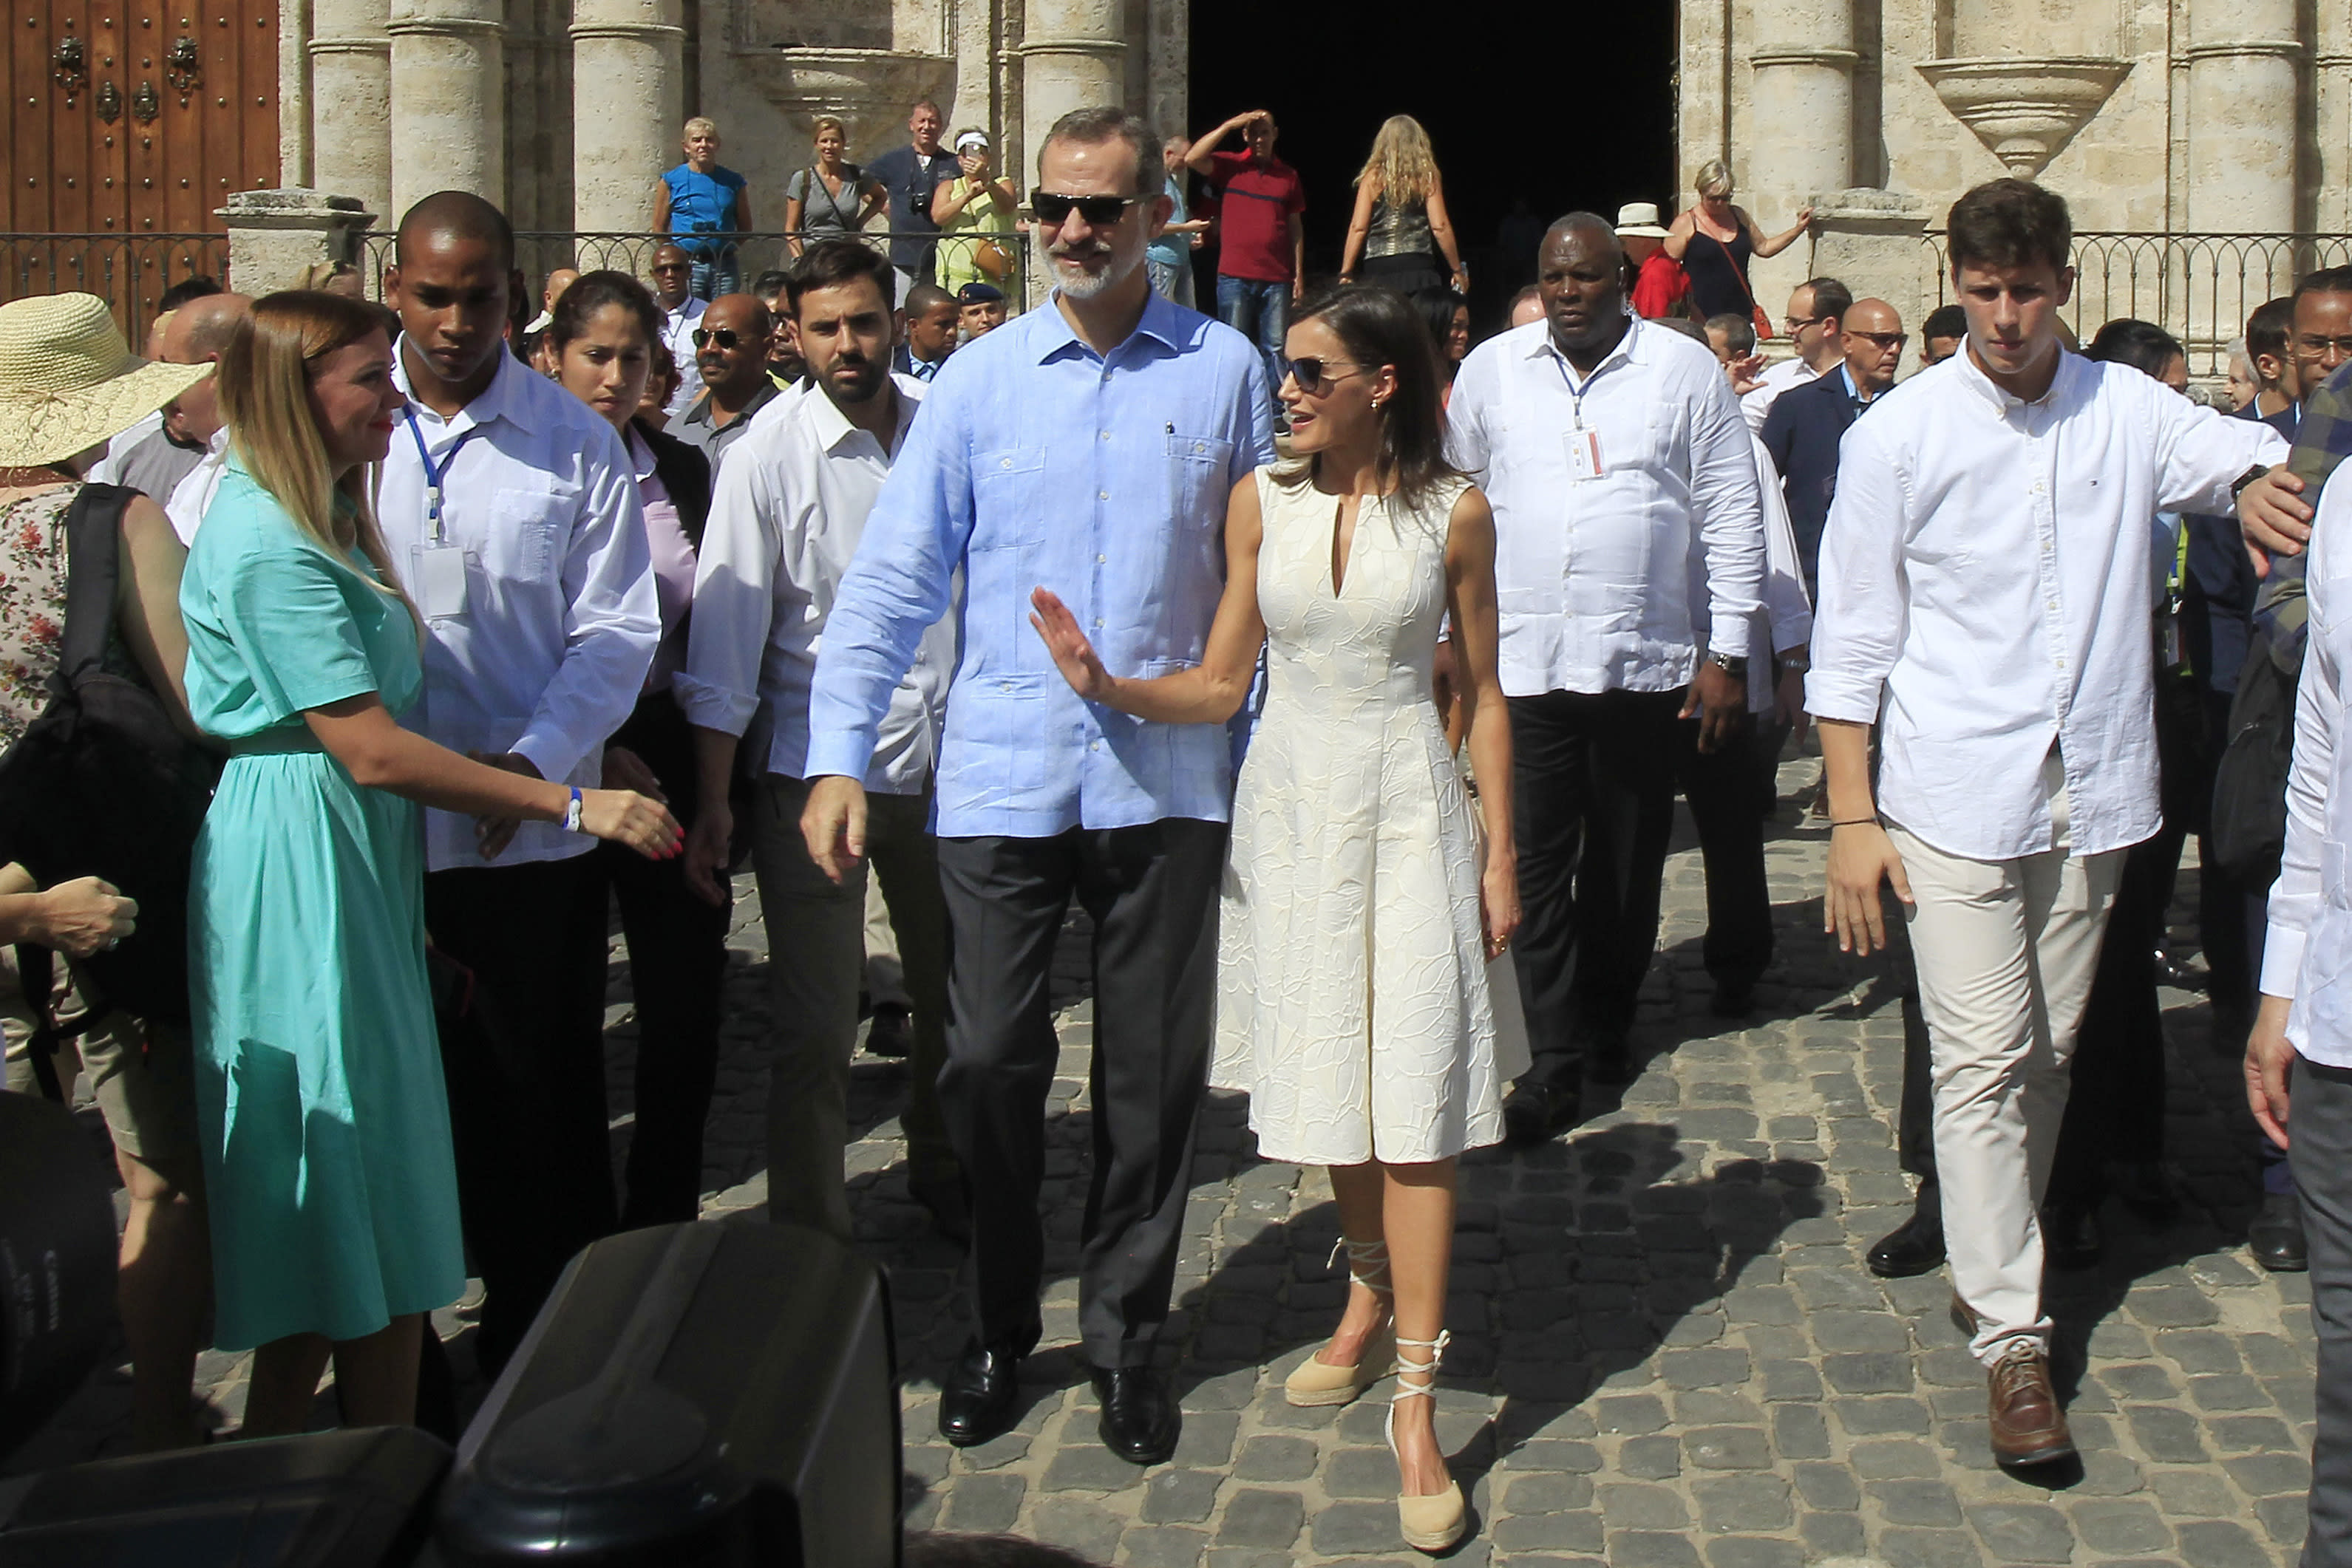 Spain's King Felipe VI and Queen Letizia walk in Old Havana, Cuba, Tuesday, Nov. 12, 2019. (Jorge Luis Baños/Pool Photo via AP)